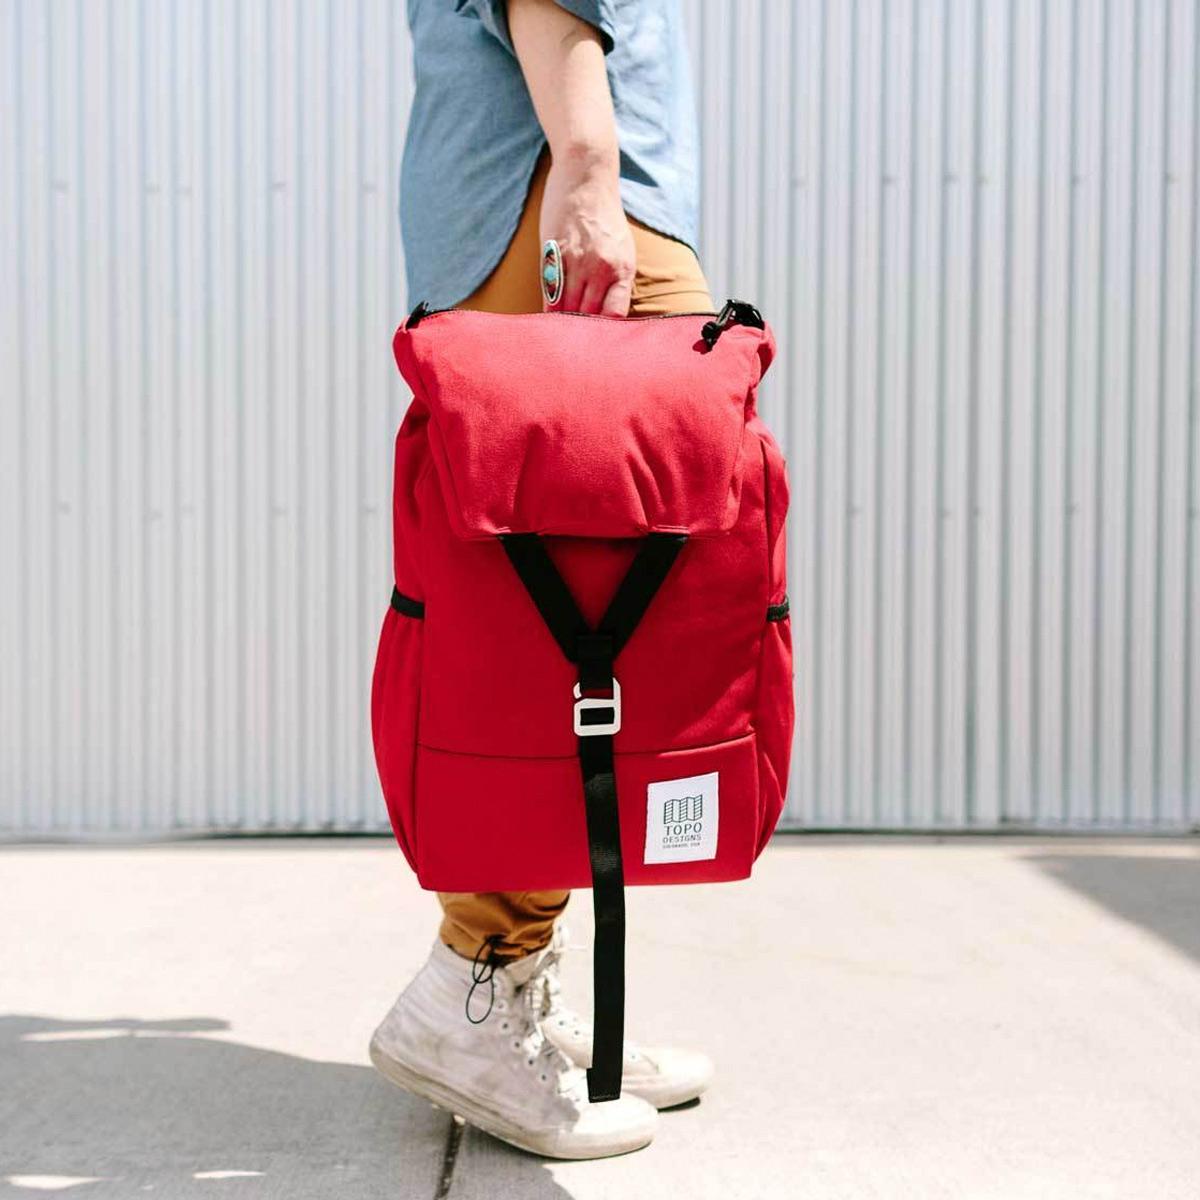 Topo Designs Y-Pack Red fijne dagrugzak met een brede klep en éénpunts sluiting